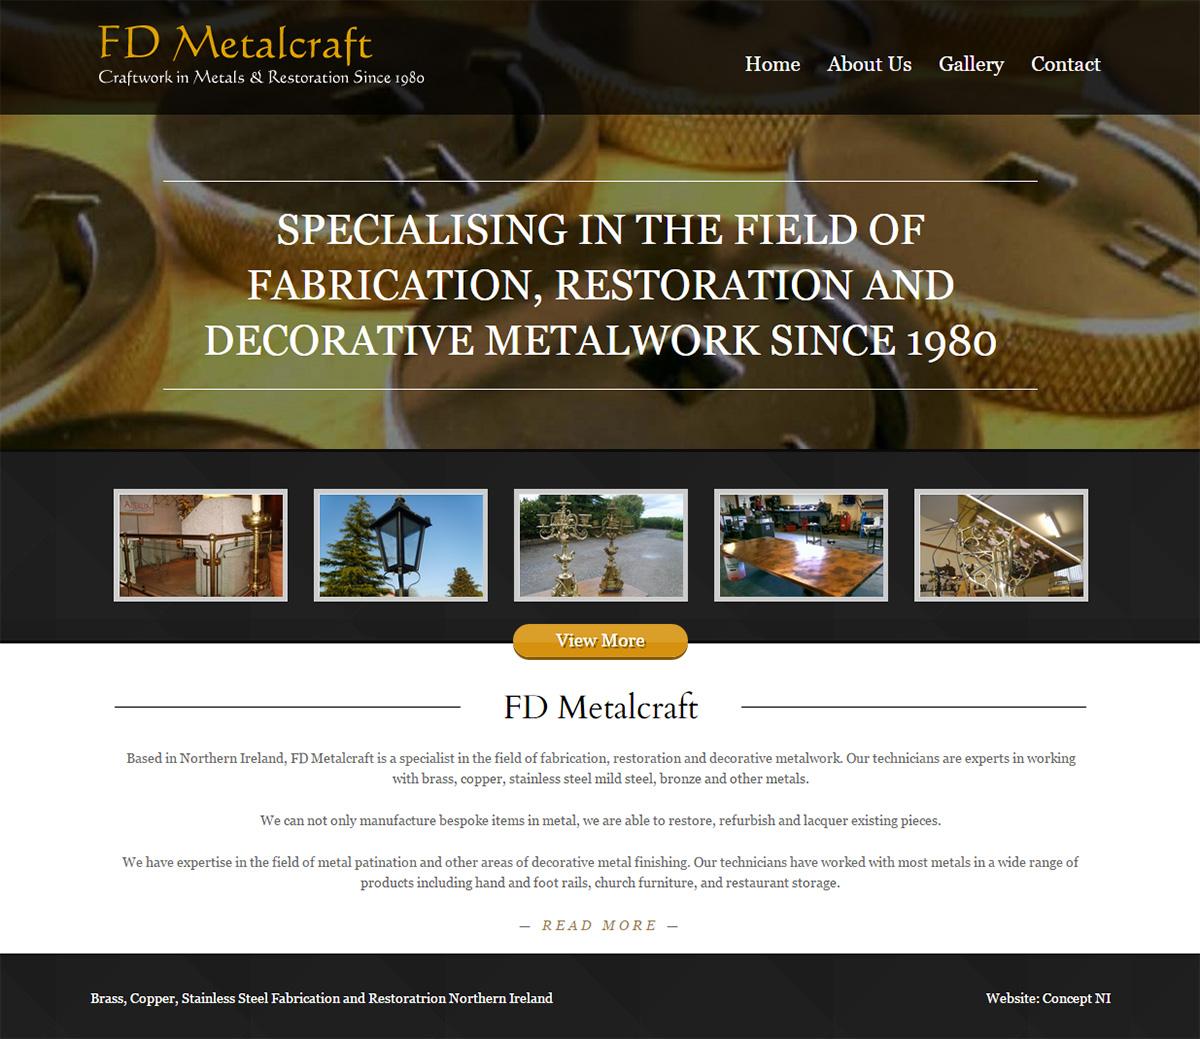 FD Metalcraft